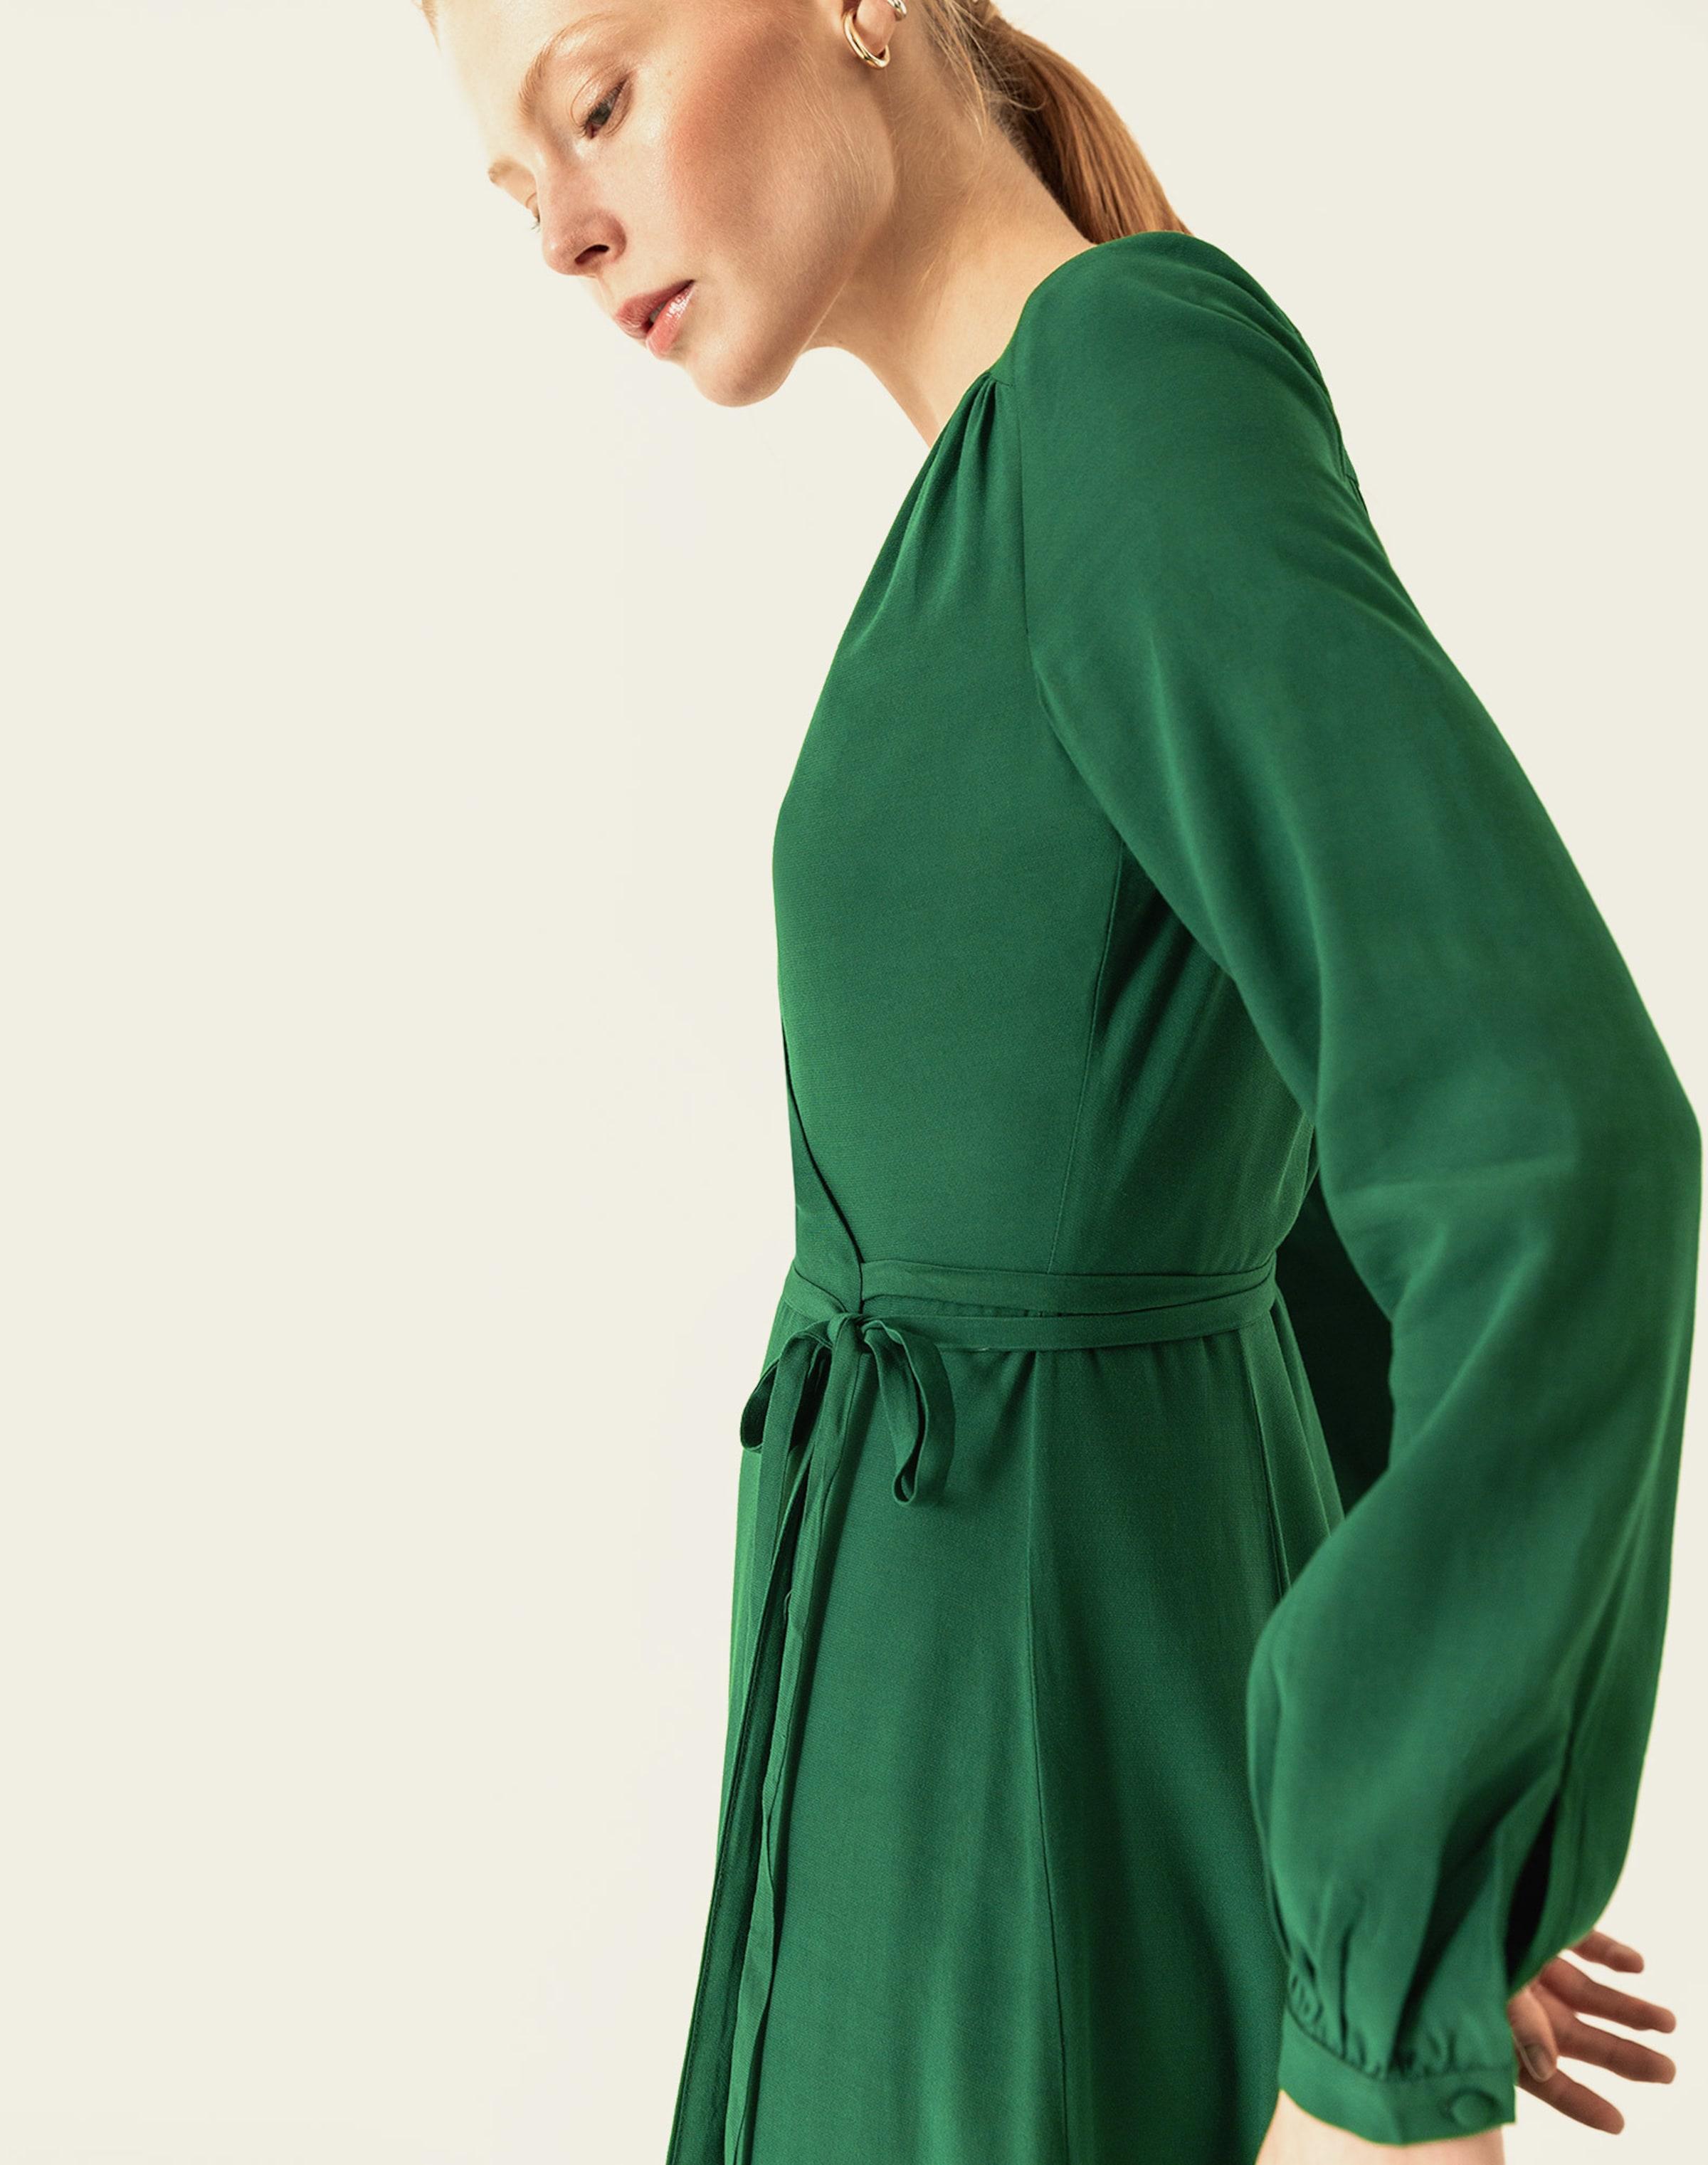 Oak Dress In Grün Ivyamp; QsCxhrdt